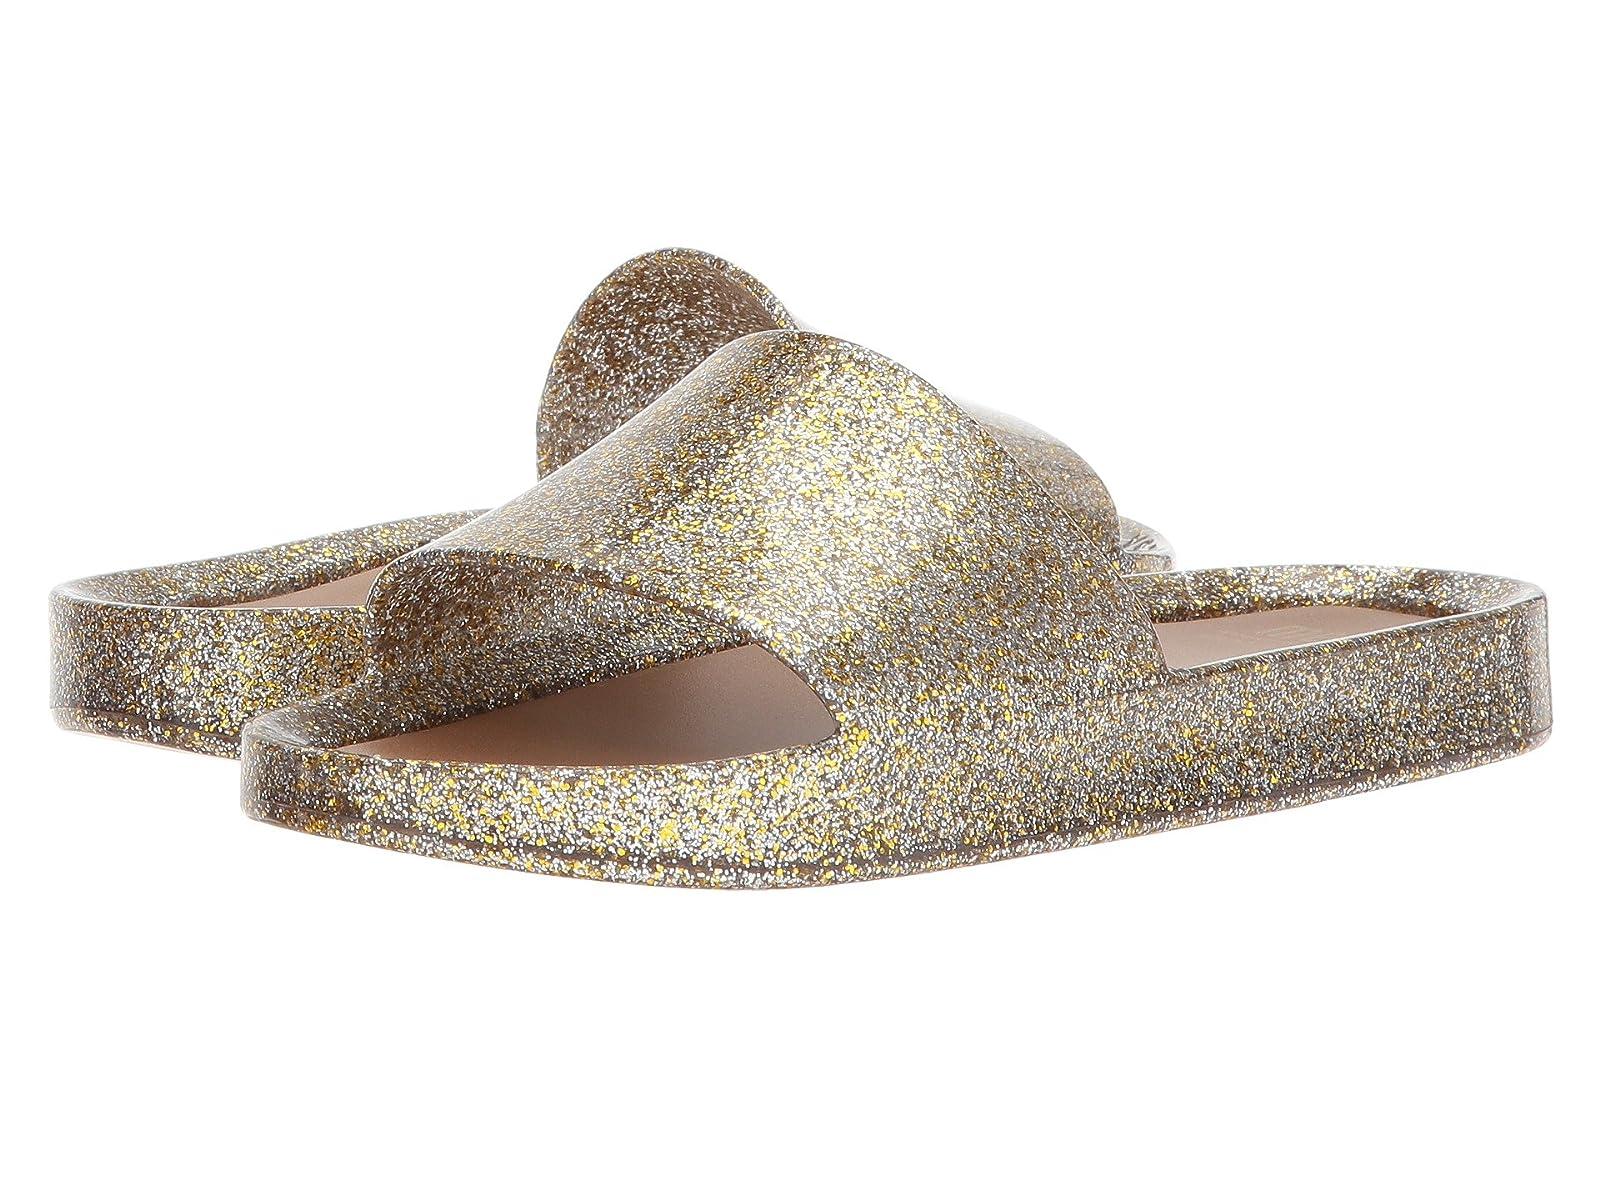 Mini Melissa Mel Beach Slide (Little Kid/Big Kid)Atmospheric grades have affordable shoes